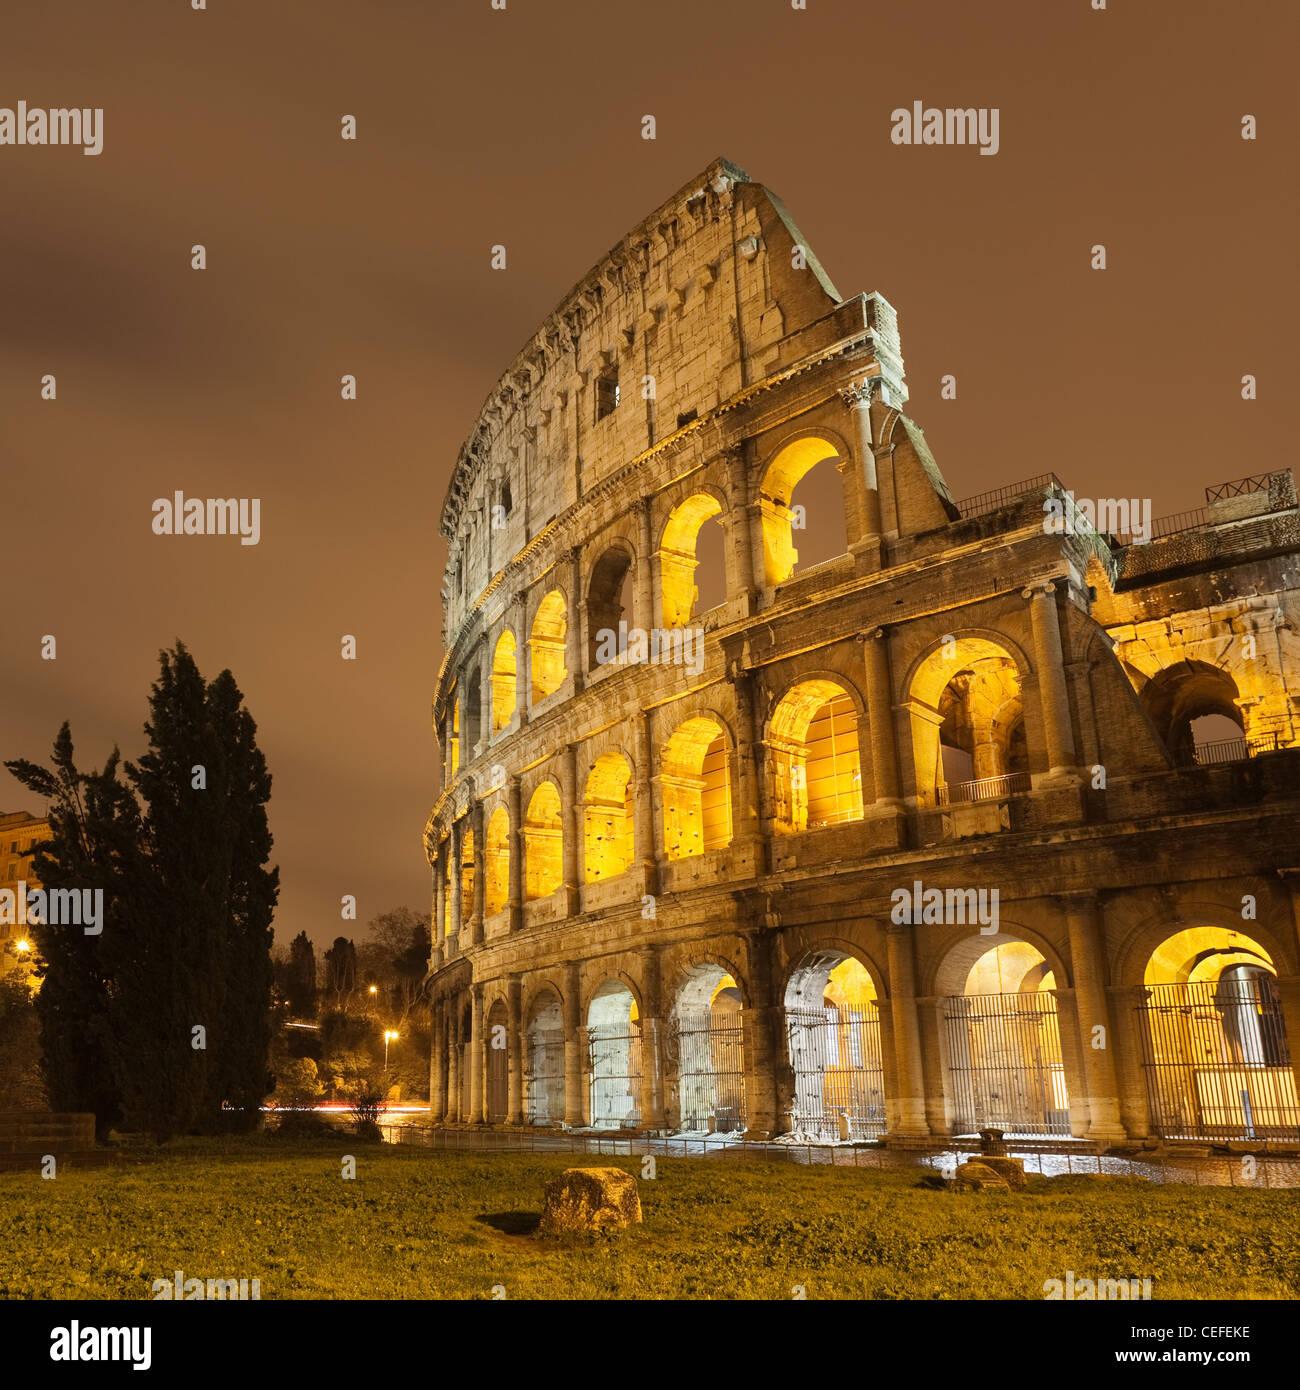 Coliseo romano iluminado por la noche Imagen De Stock